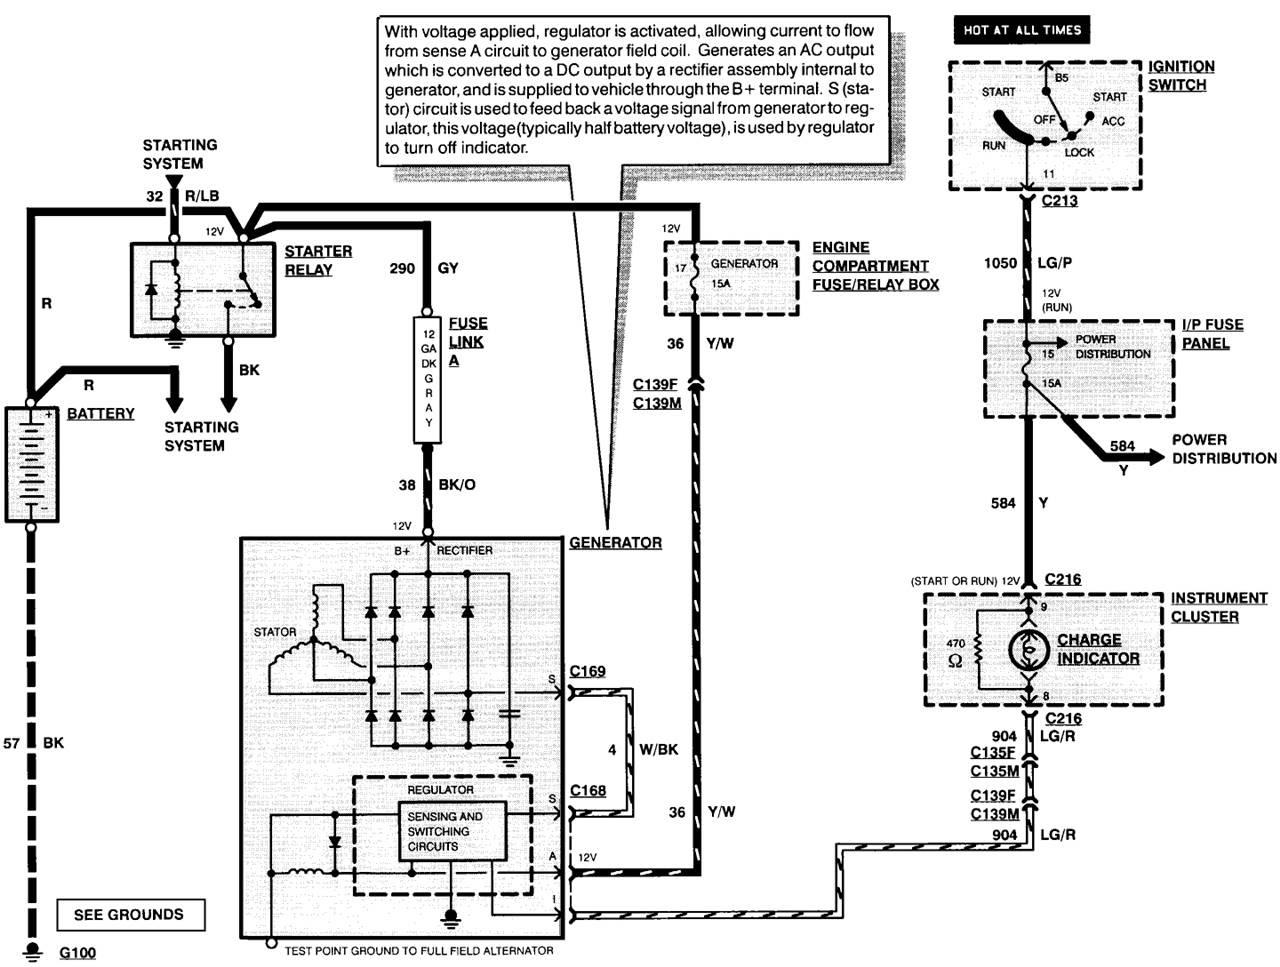 1992 Corvette Alternator Wiring Diagram Wiring Diagram Server A Server A Lastanzadeltempo It